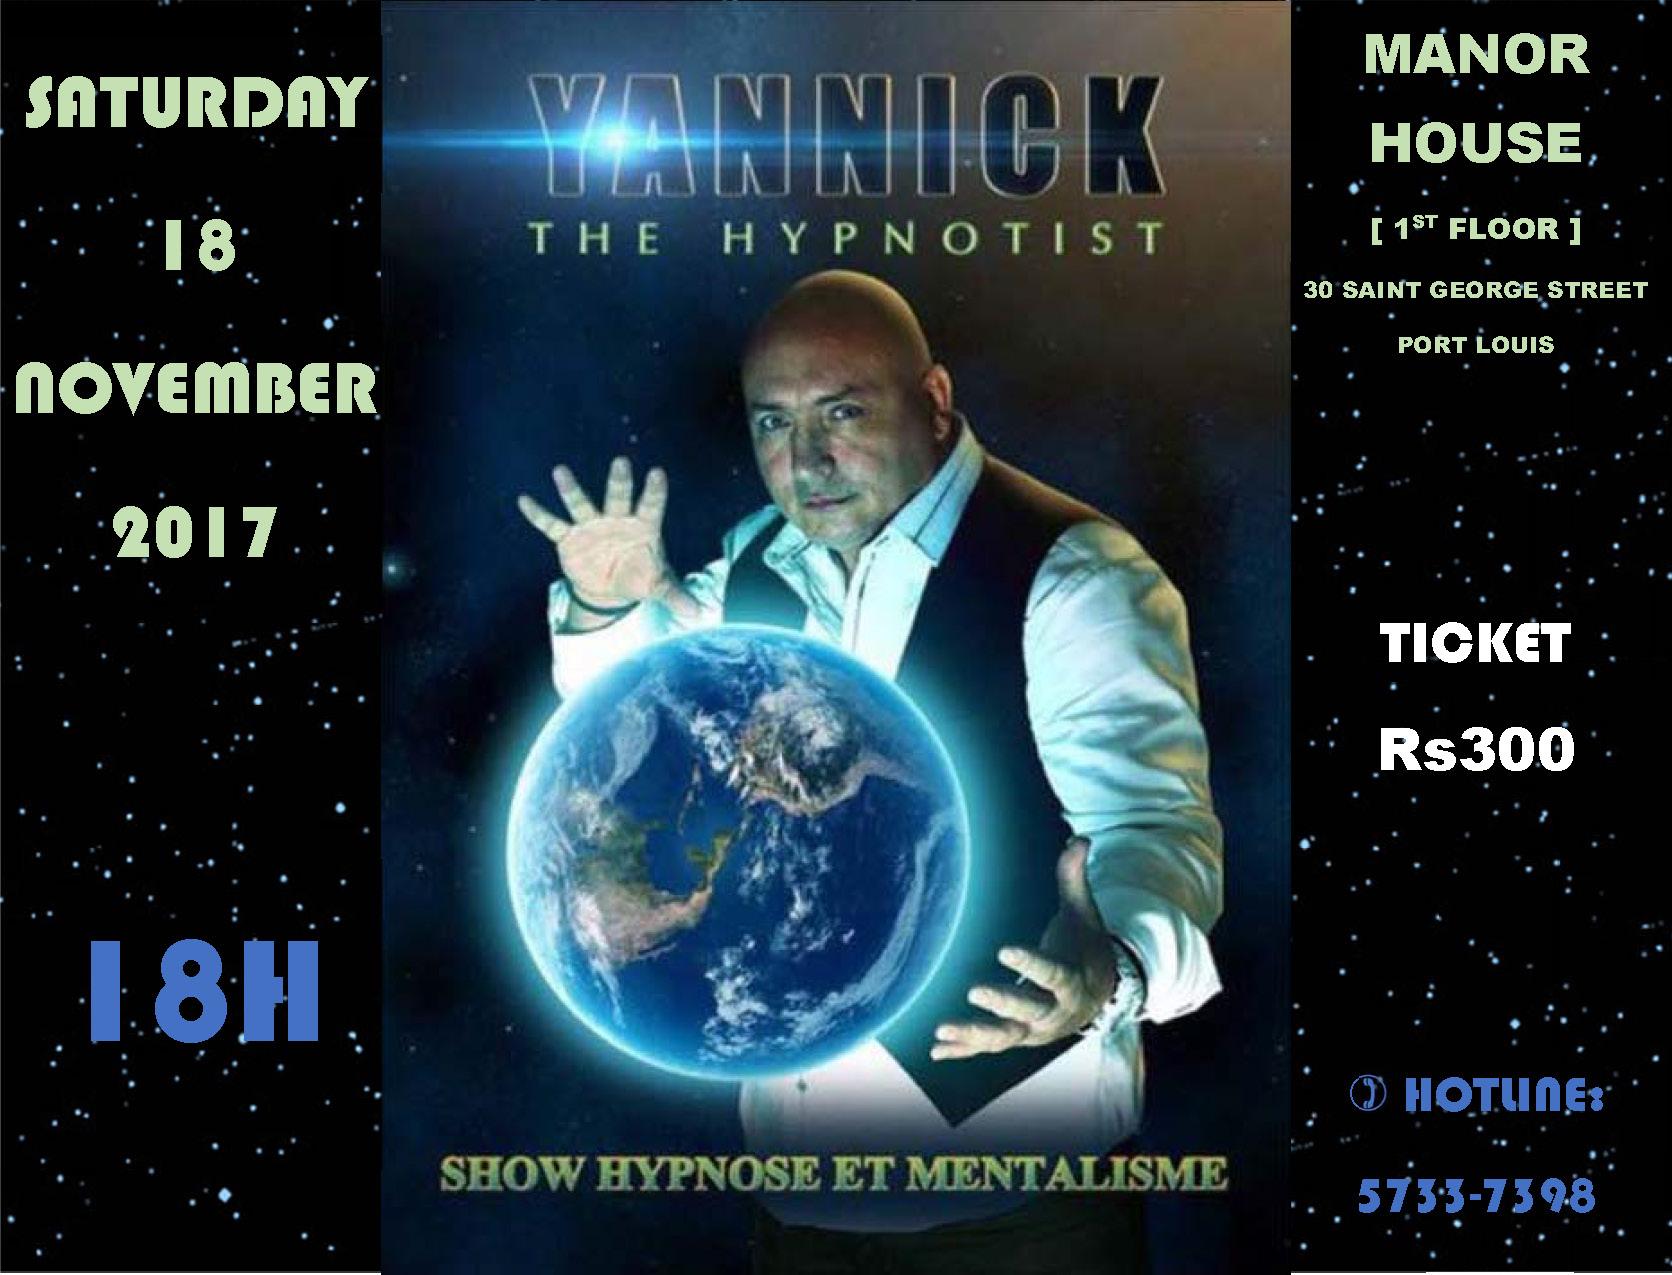 EVENT YANNICK – 18.11.2017